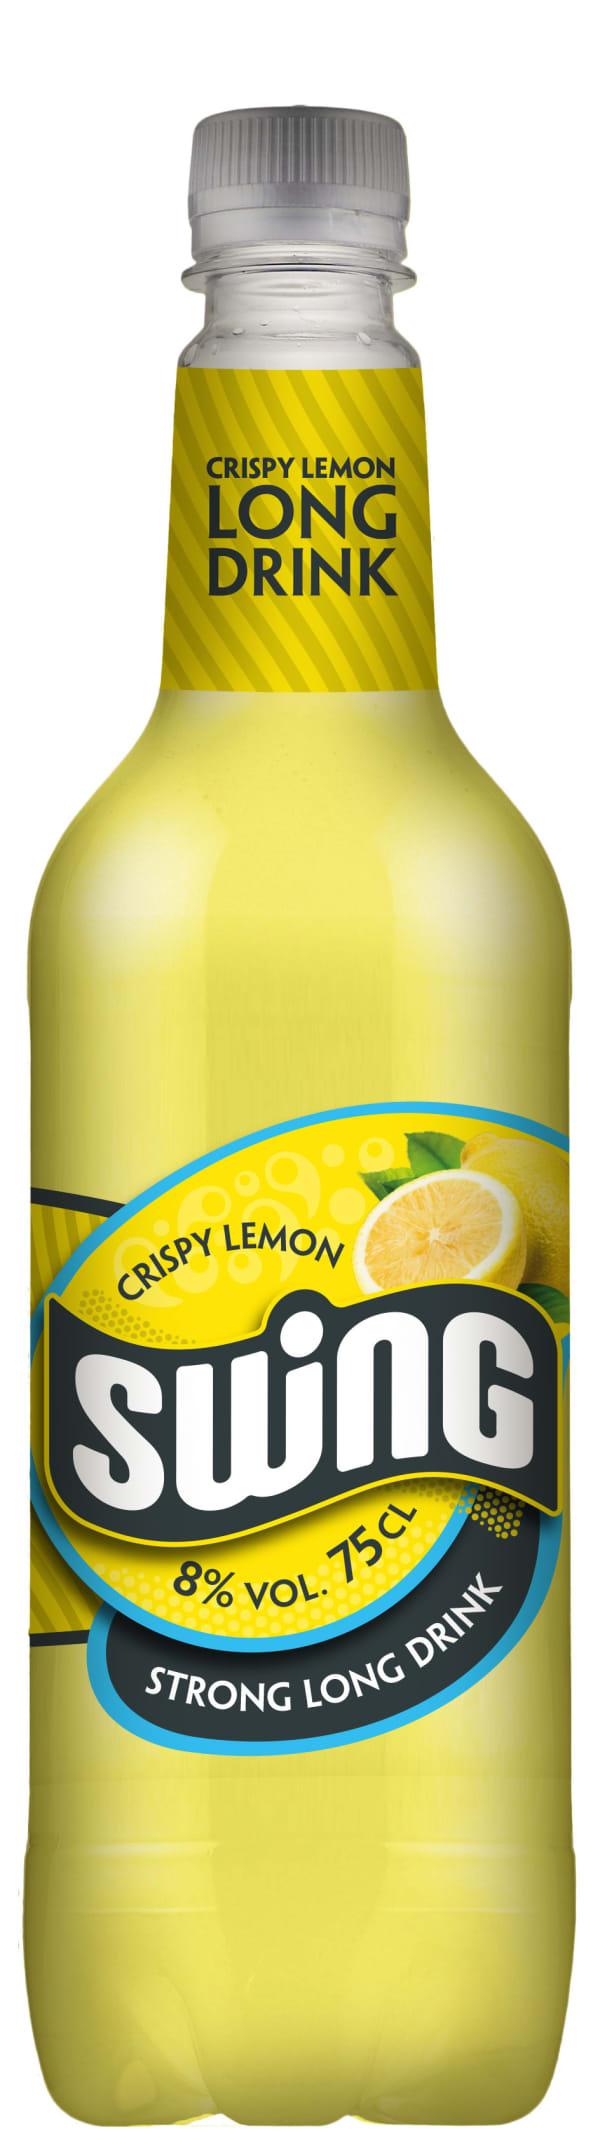 Swing Crispy Lemon Strong Long Drink muovipullo